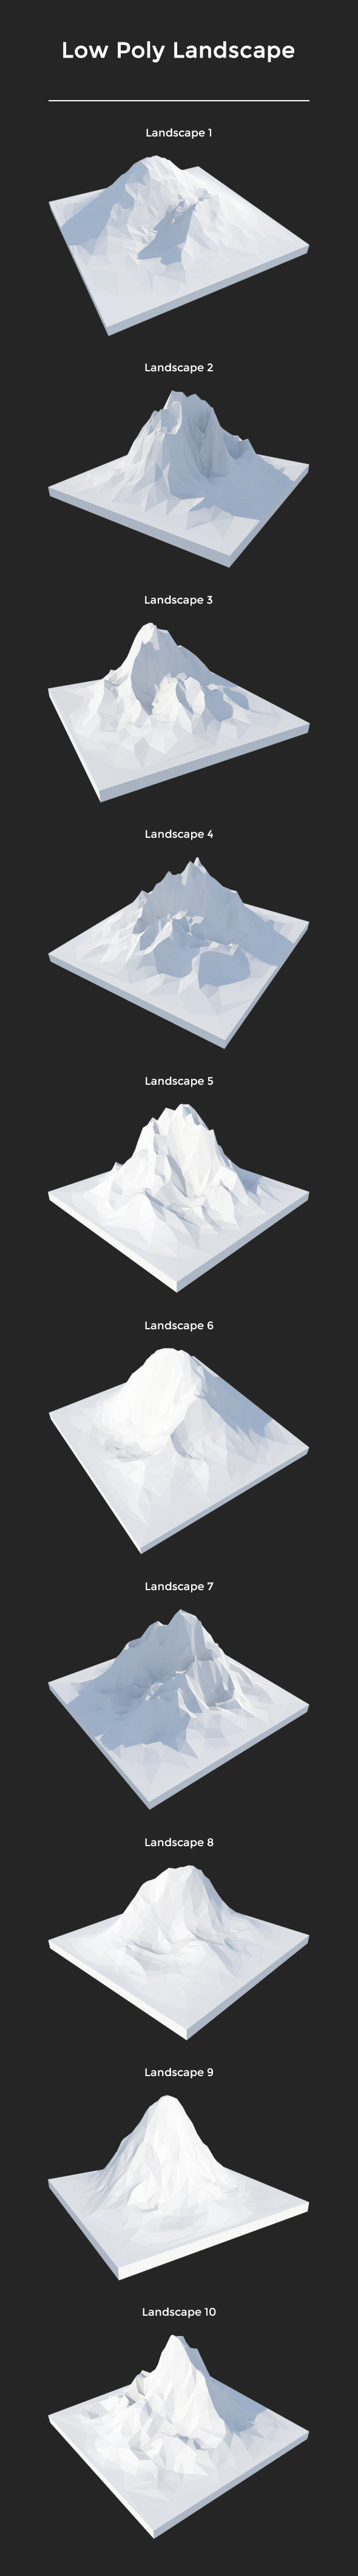 3DOcean Pack Low Poly Landscape 12040378